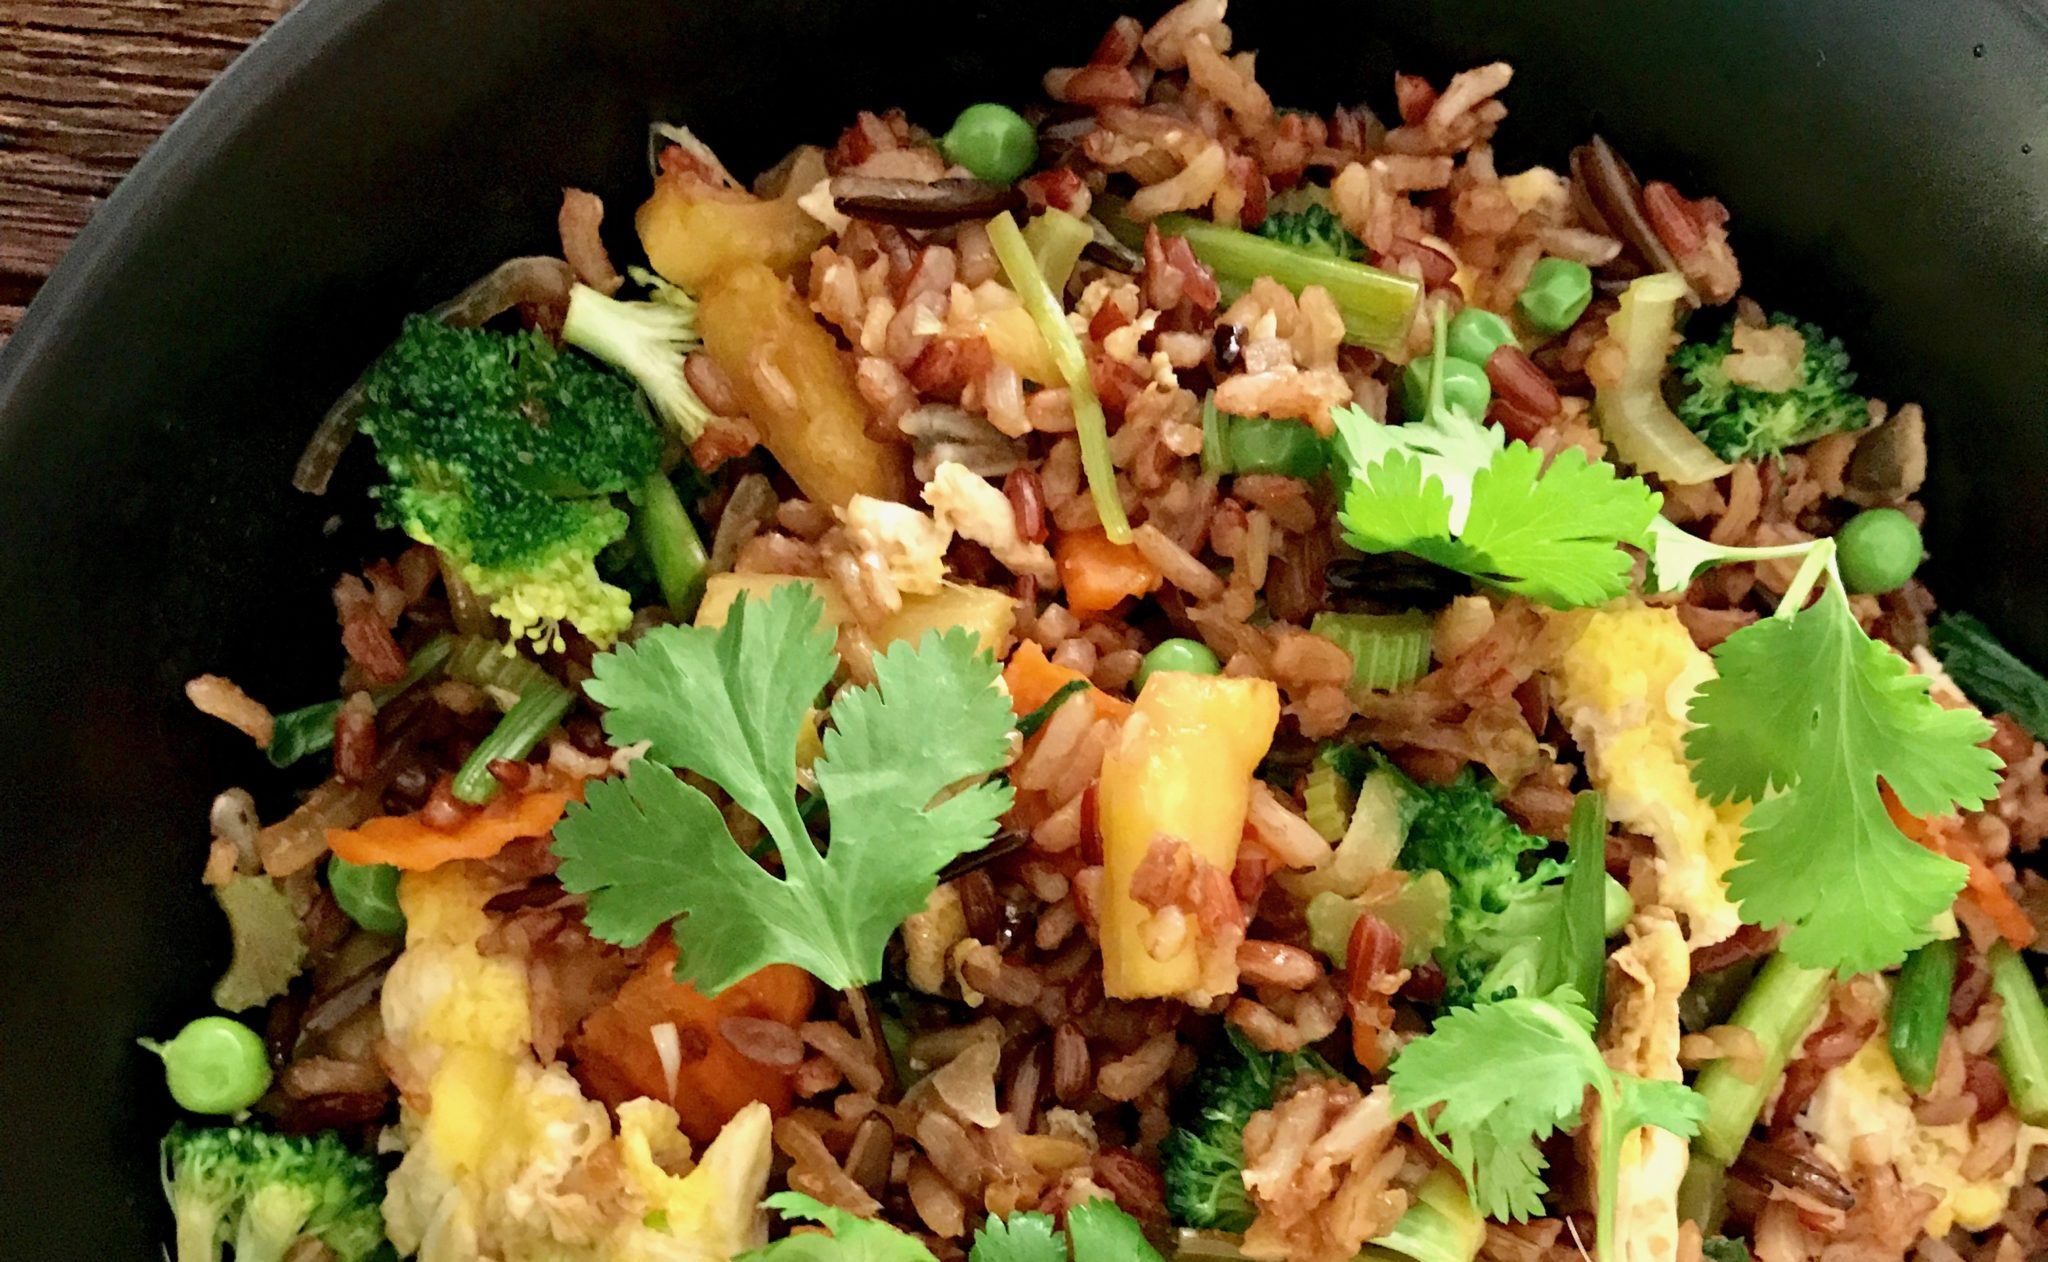 garnish it with cilantro, and enjoy!